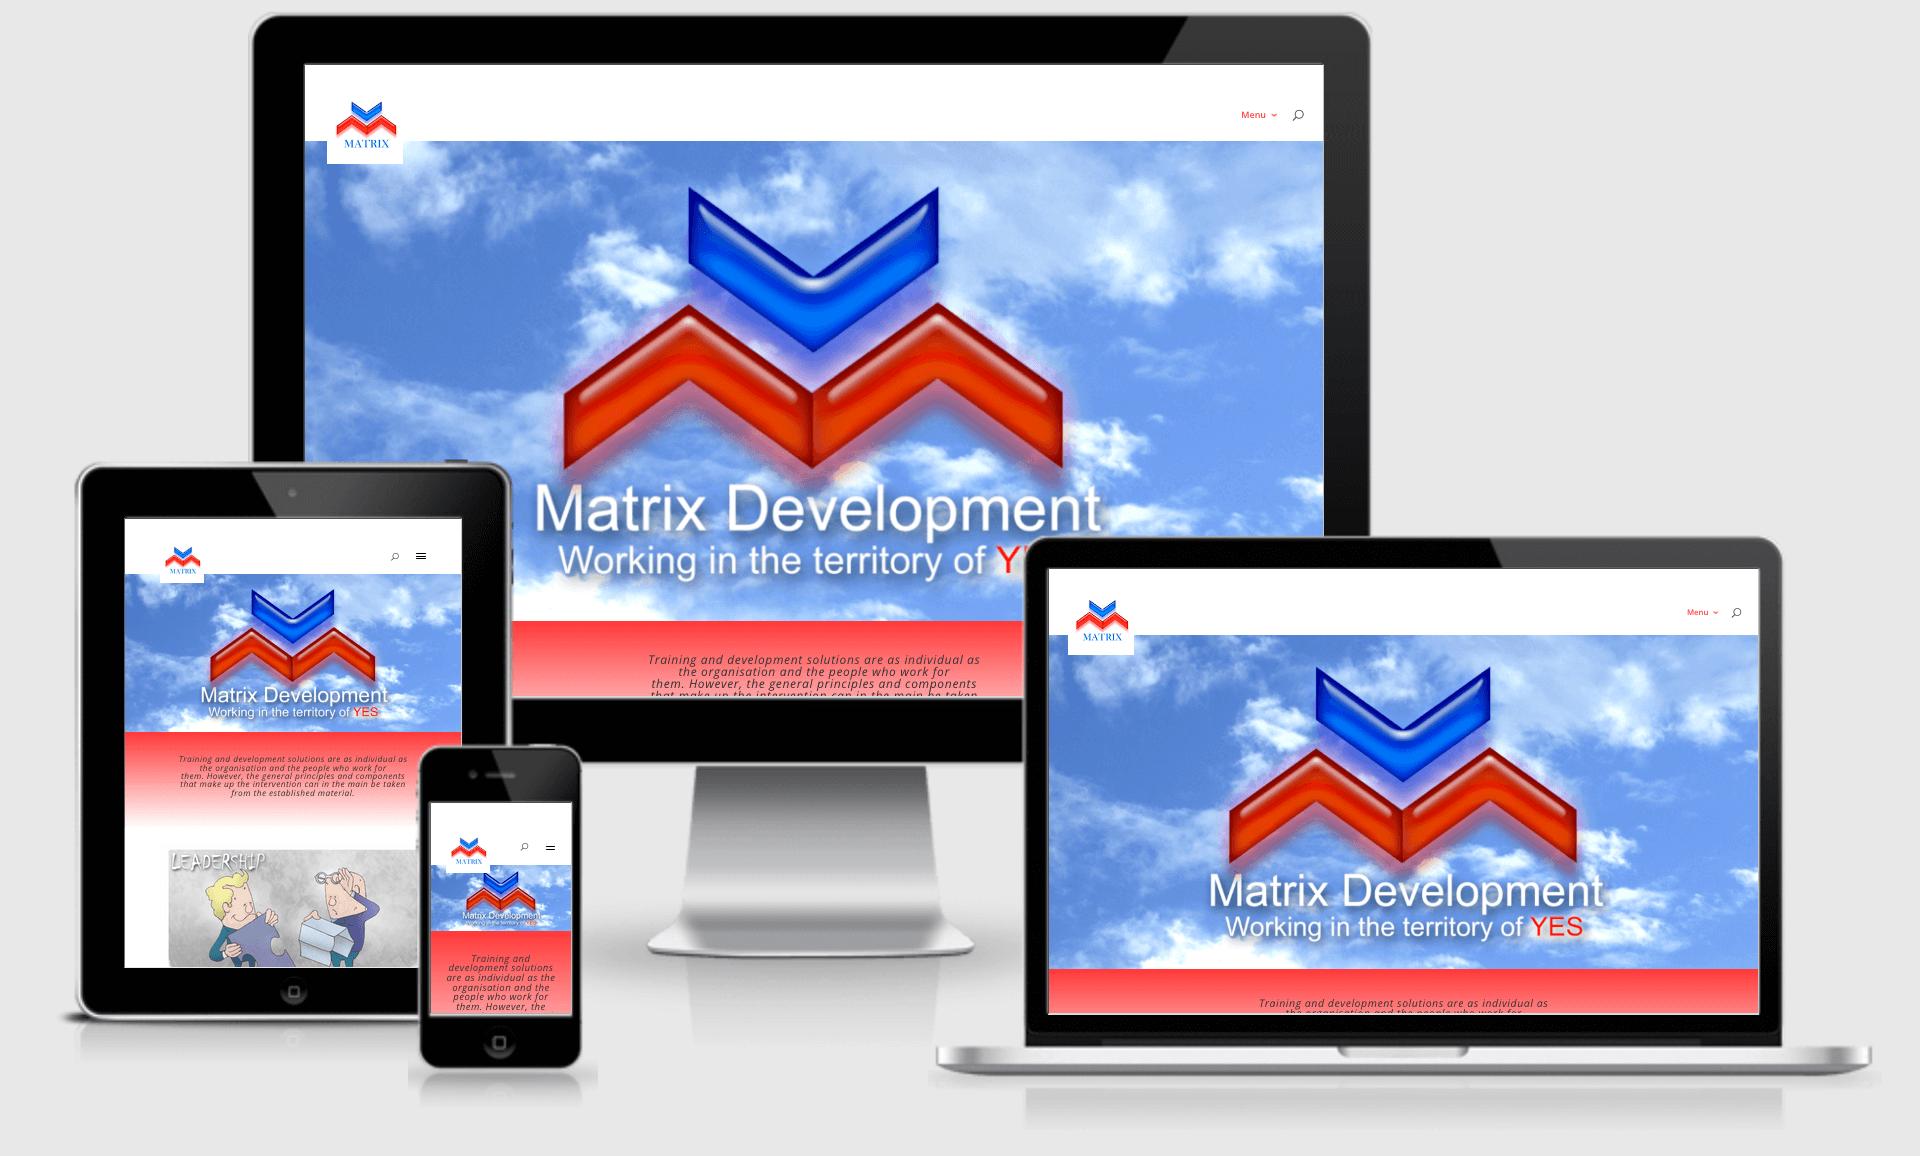 Matrix Development - multiple screen displays